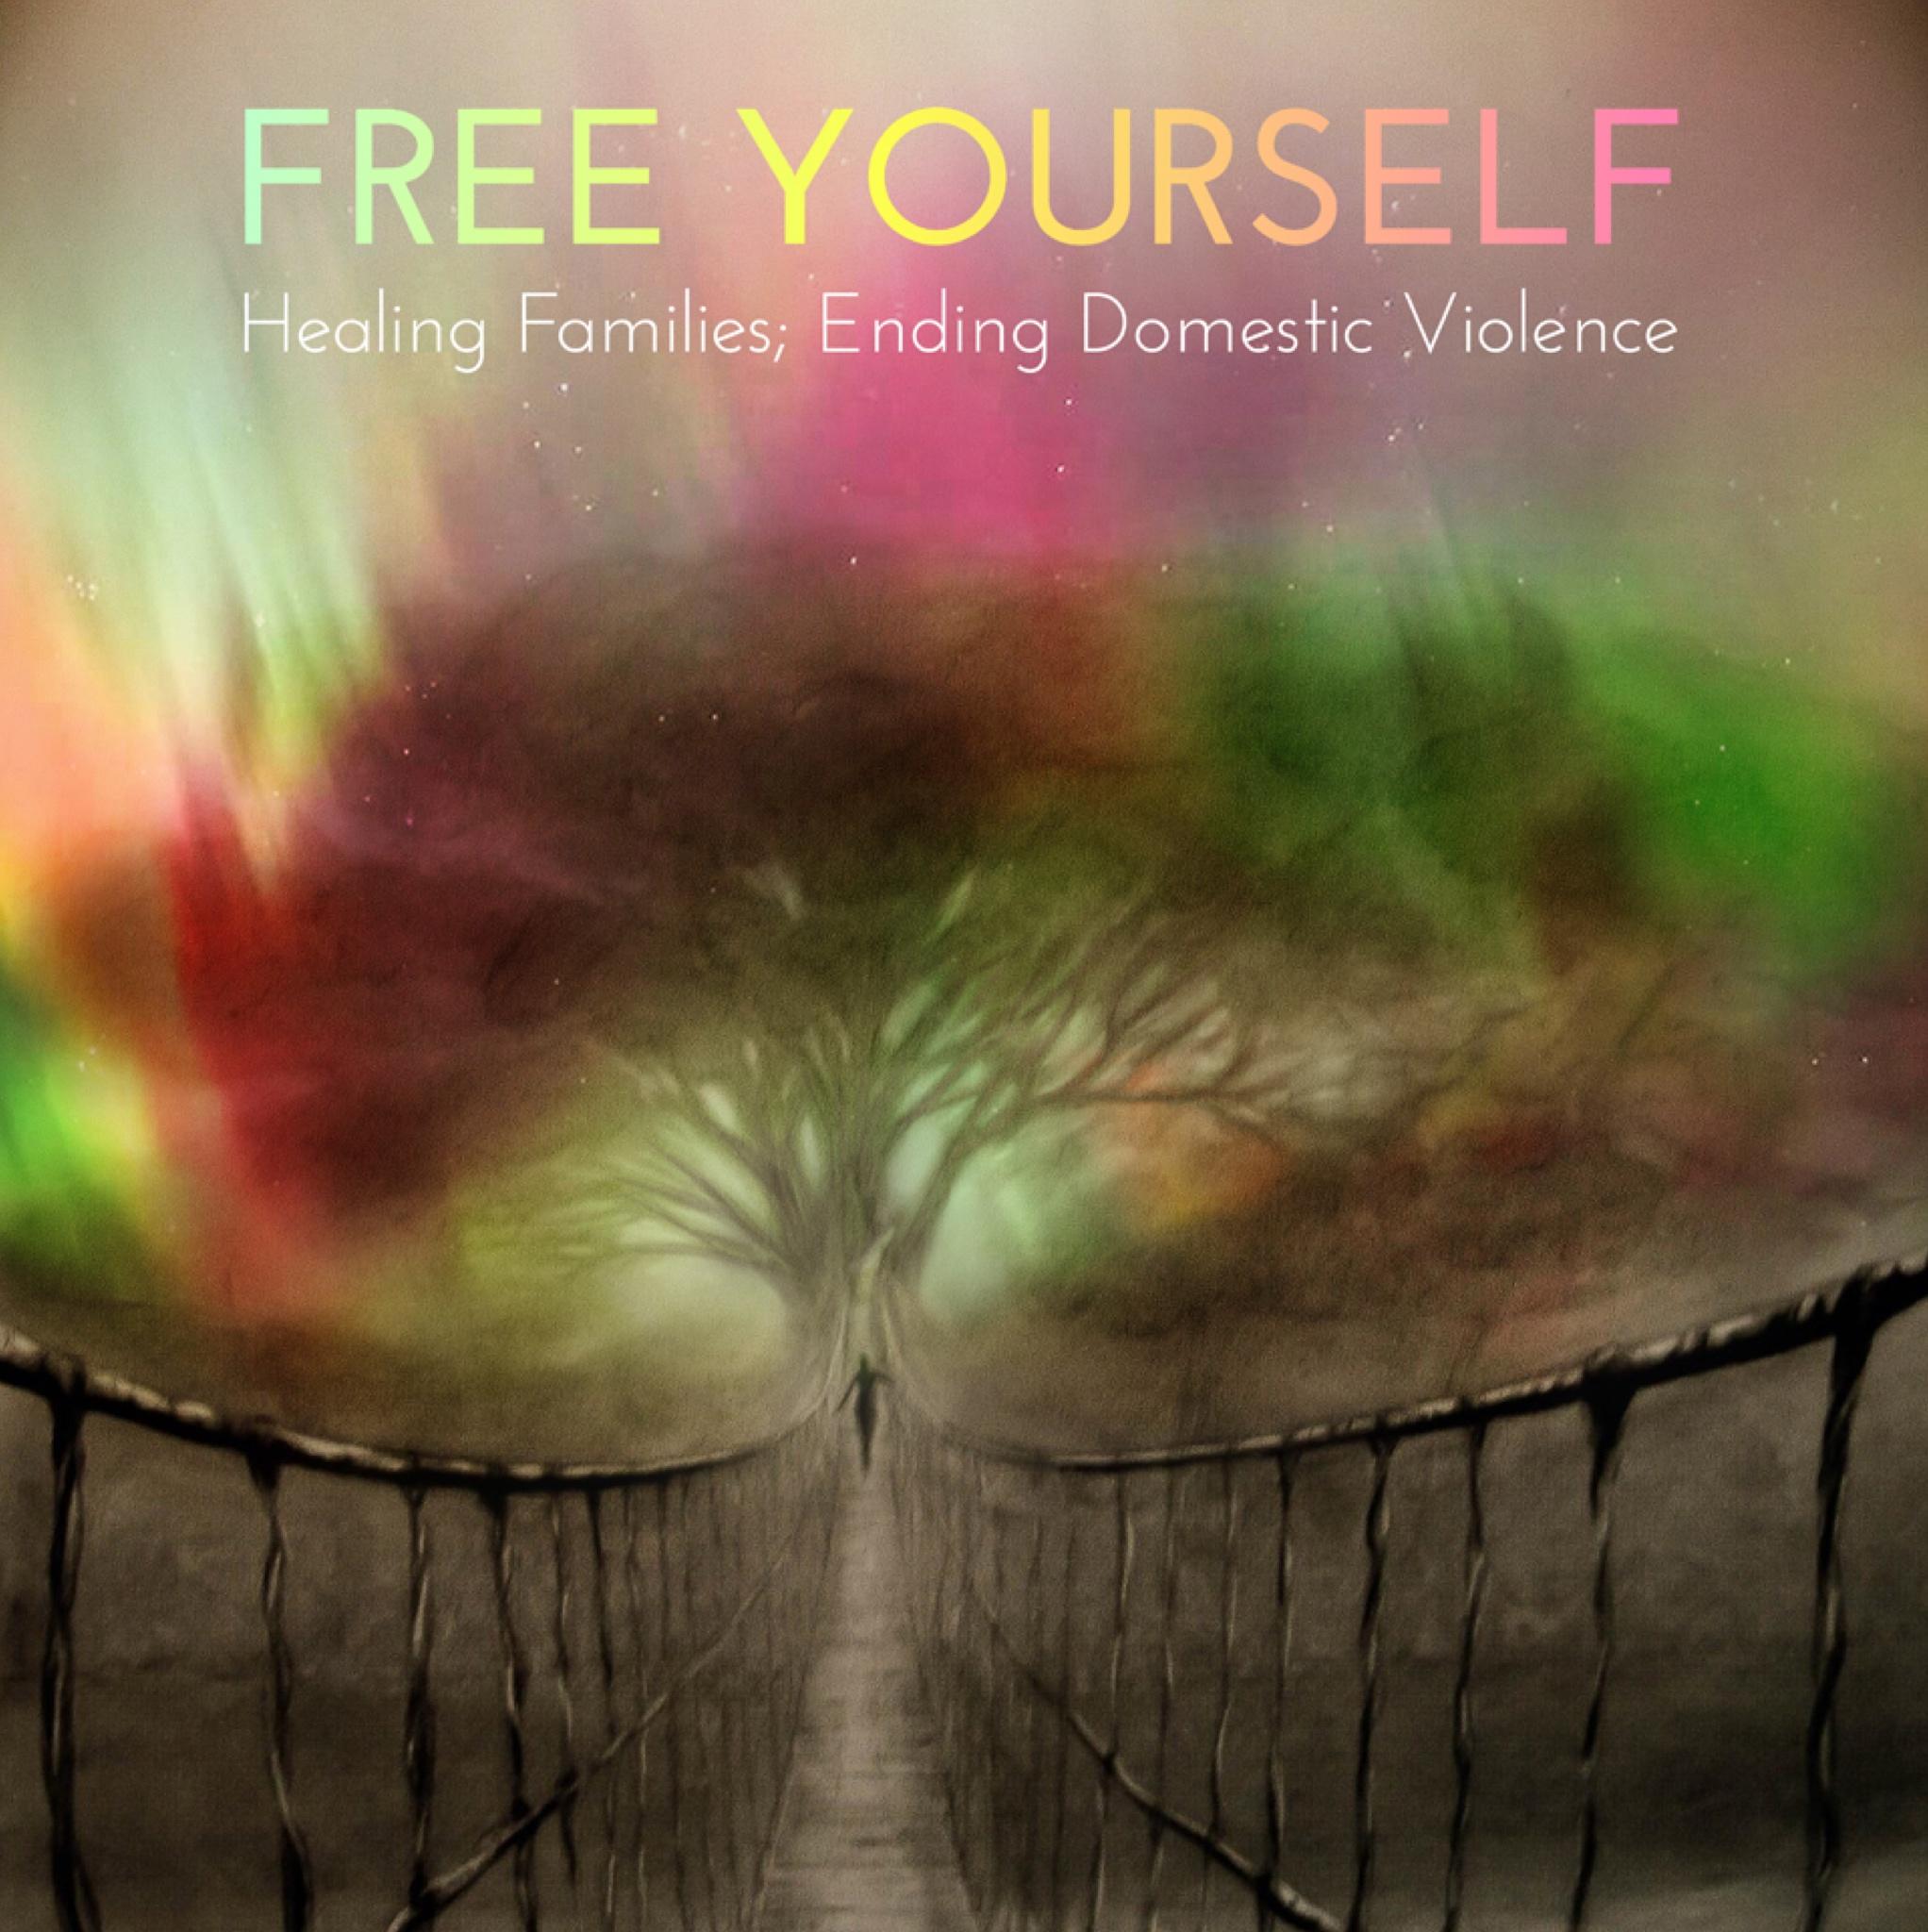 Free Yourself Global